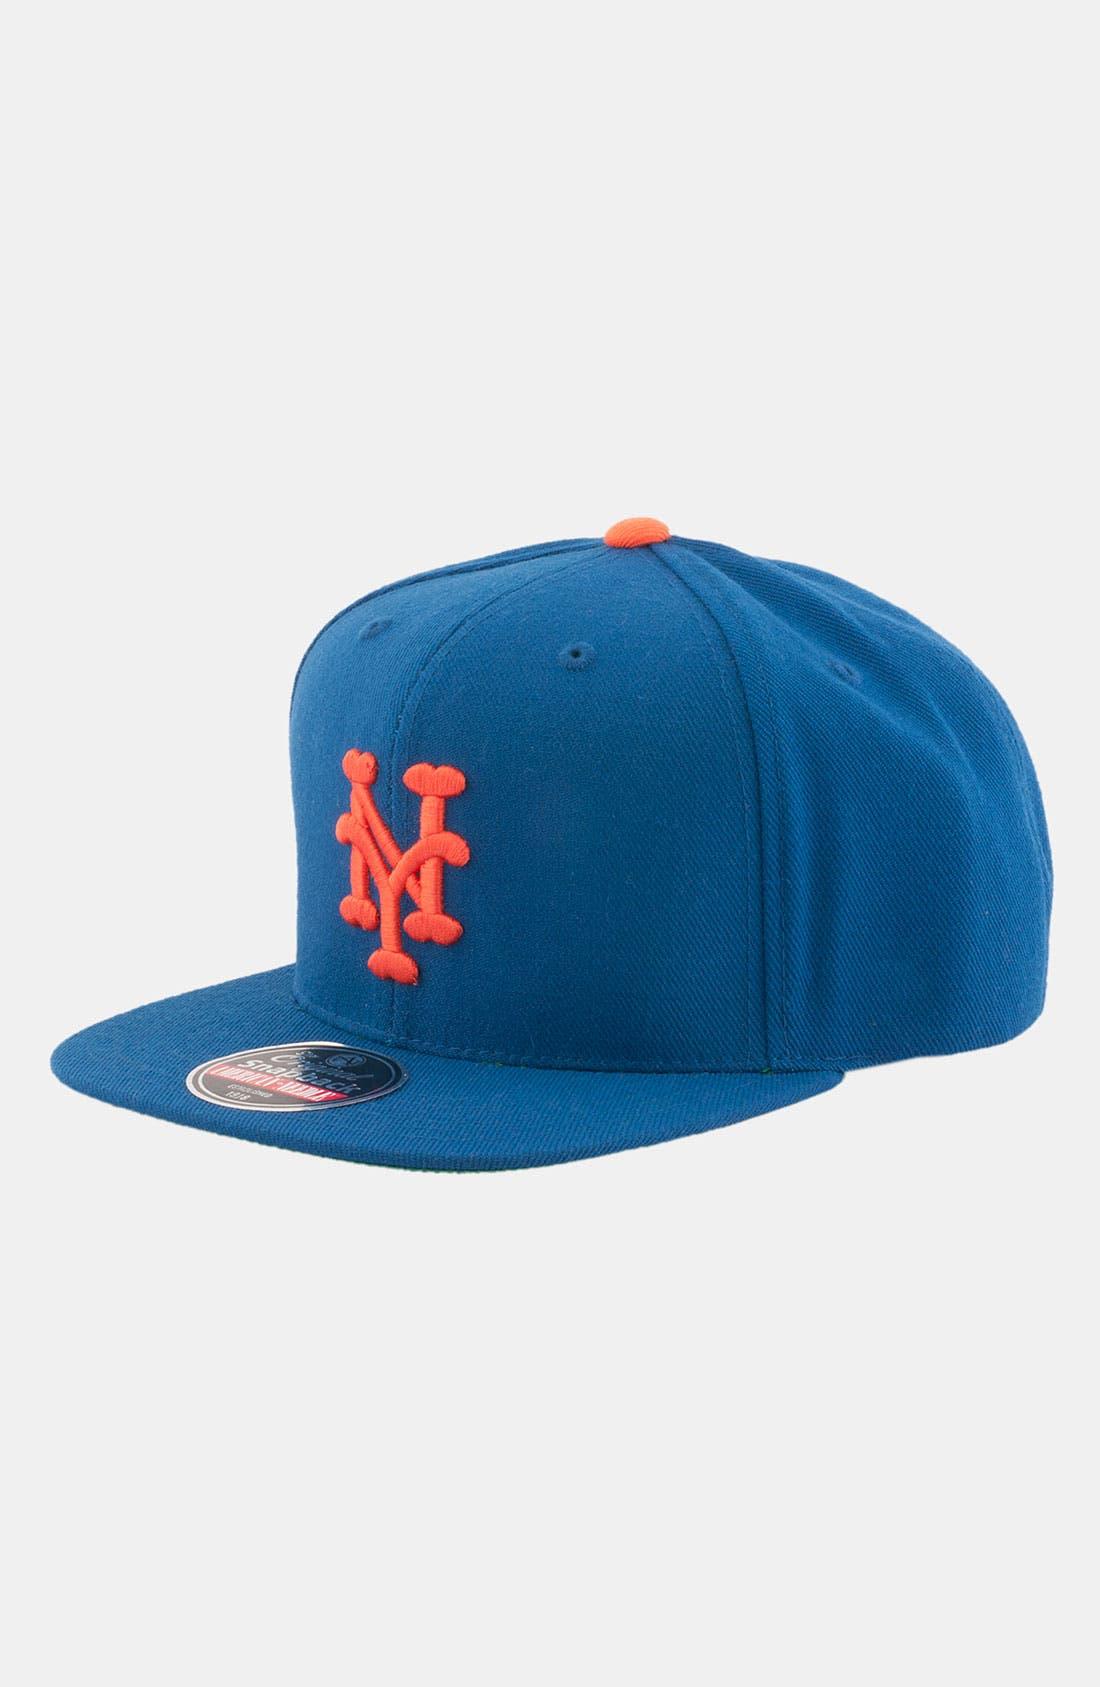 Main Image - American Needle 'New York Mets - Cooperstown' Snapback Baseball Cap